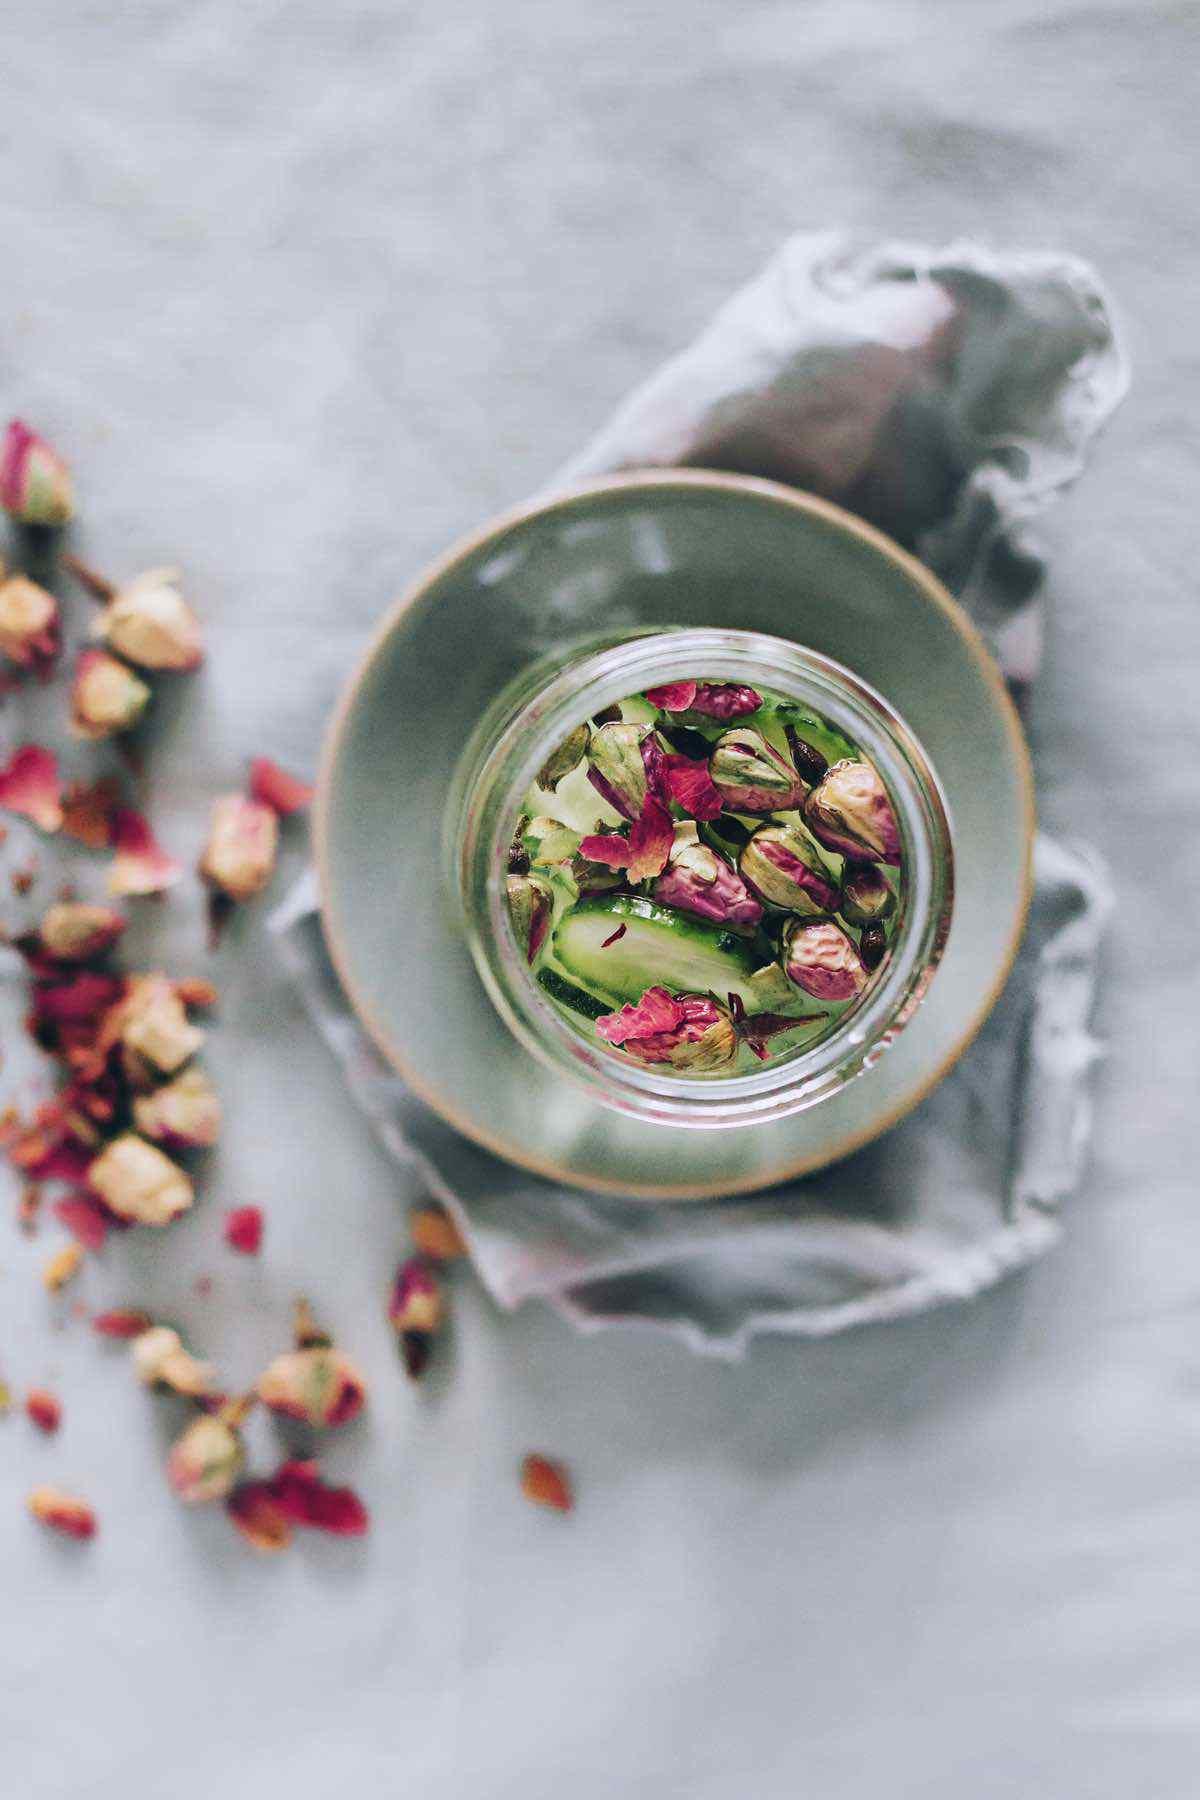 rose water ingredients